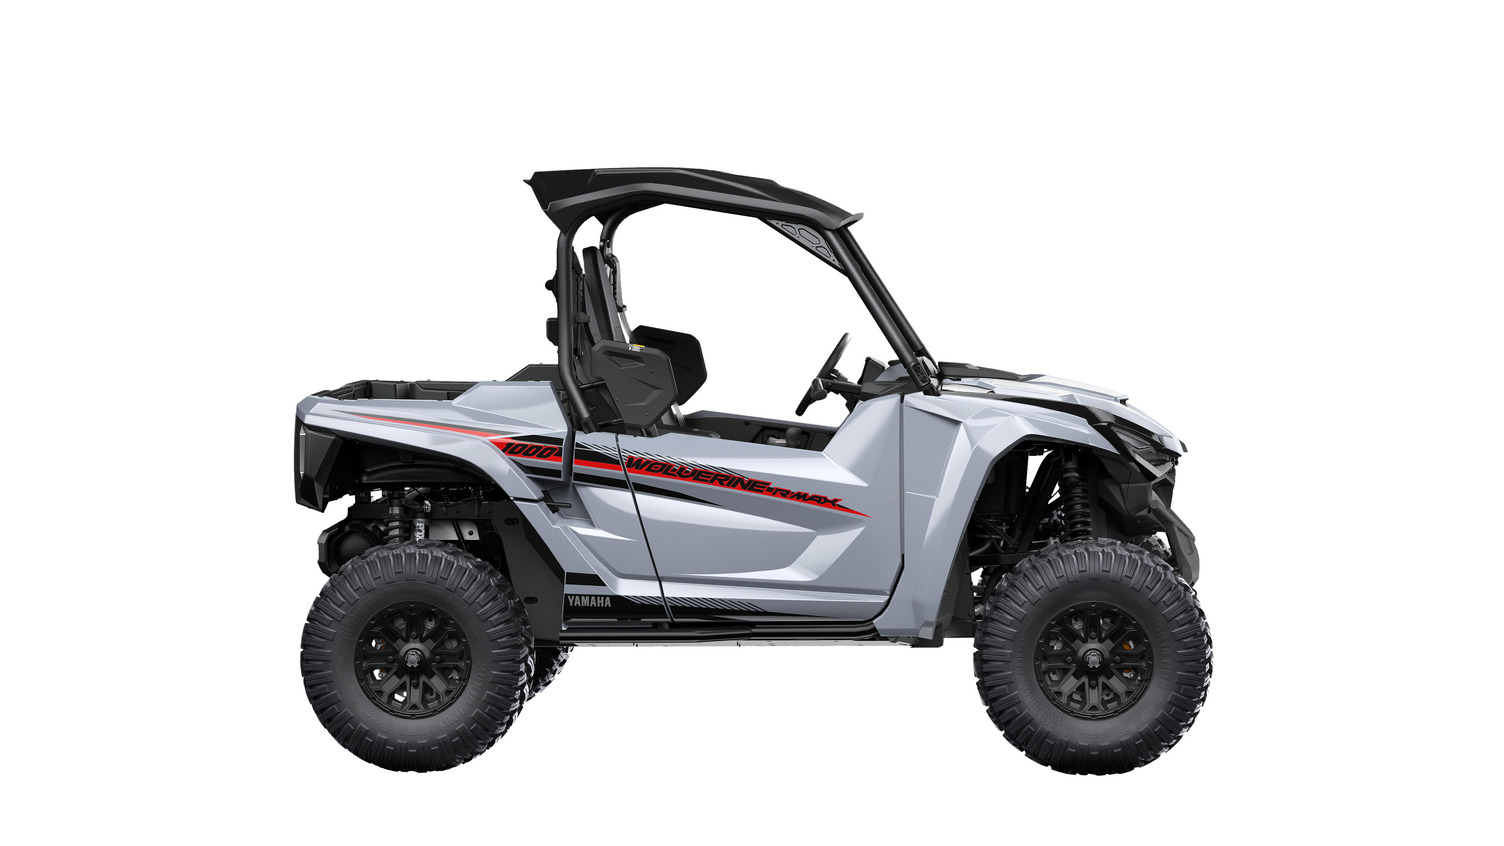 2021 Yamaha Wolverine RMAX2 1000 and RMAX4 1000 Side-by-Sides